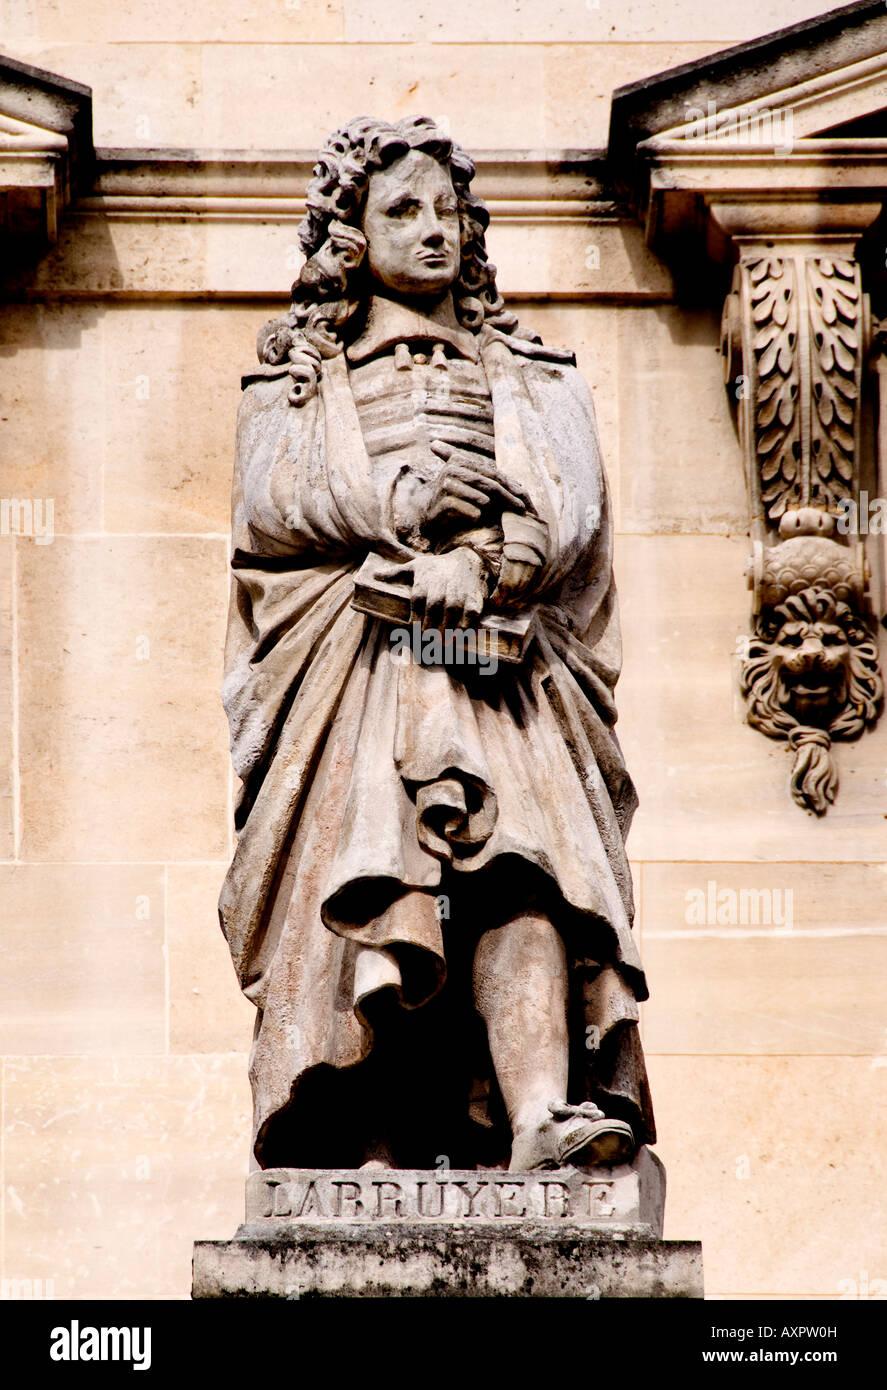 17th century french essayist 17th century 18th century 19th century timelines: the french attempt to restart the jacobite rebellion poet, essayist mikhail zemtsov, russian architect.